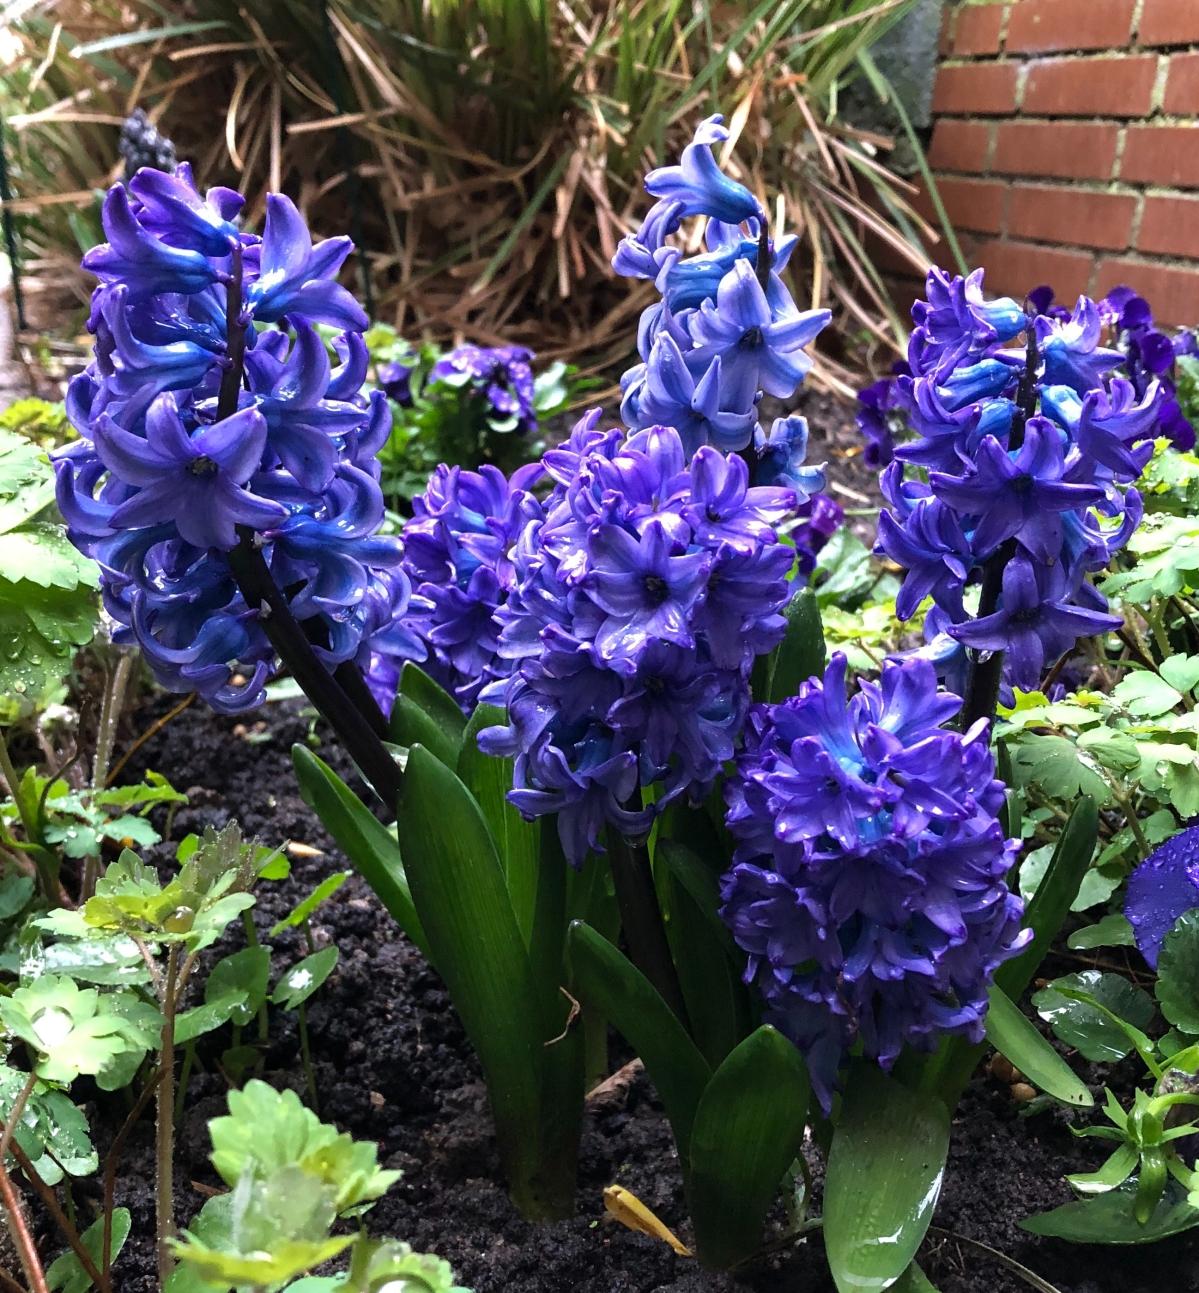 Hyacinth in my front garden